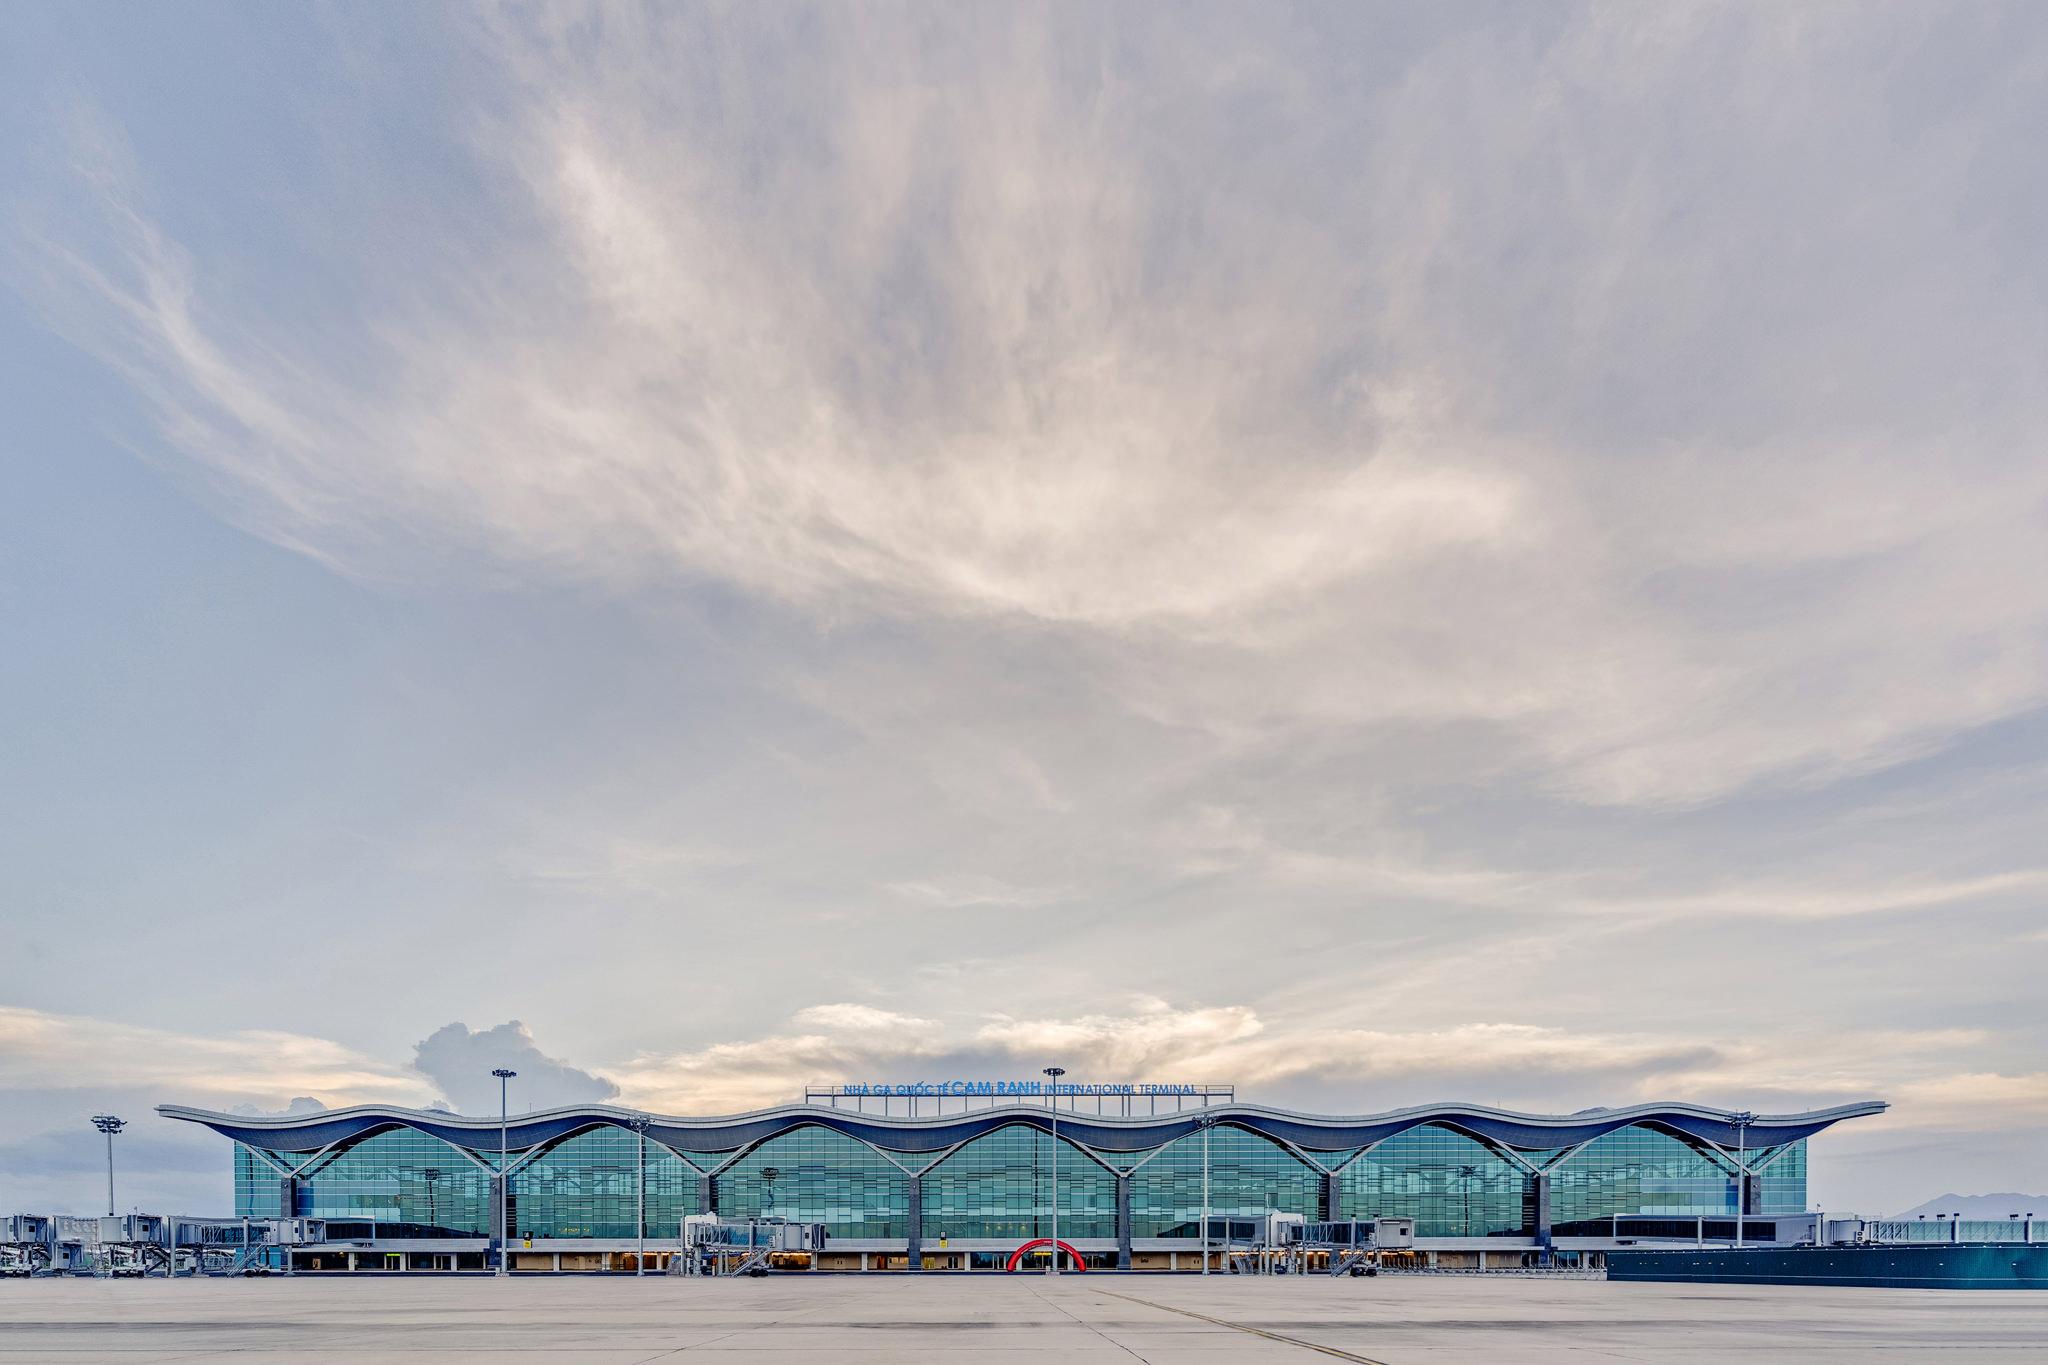 20180626 - Cam Ranh Airport - Architecture - 0372.jpg